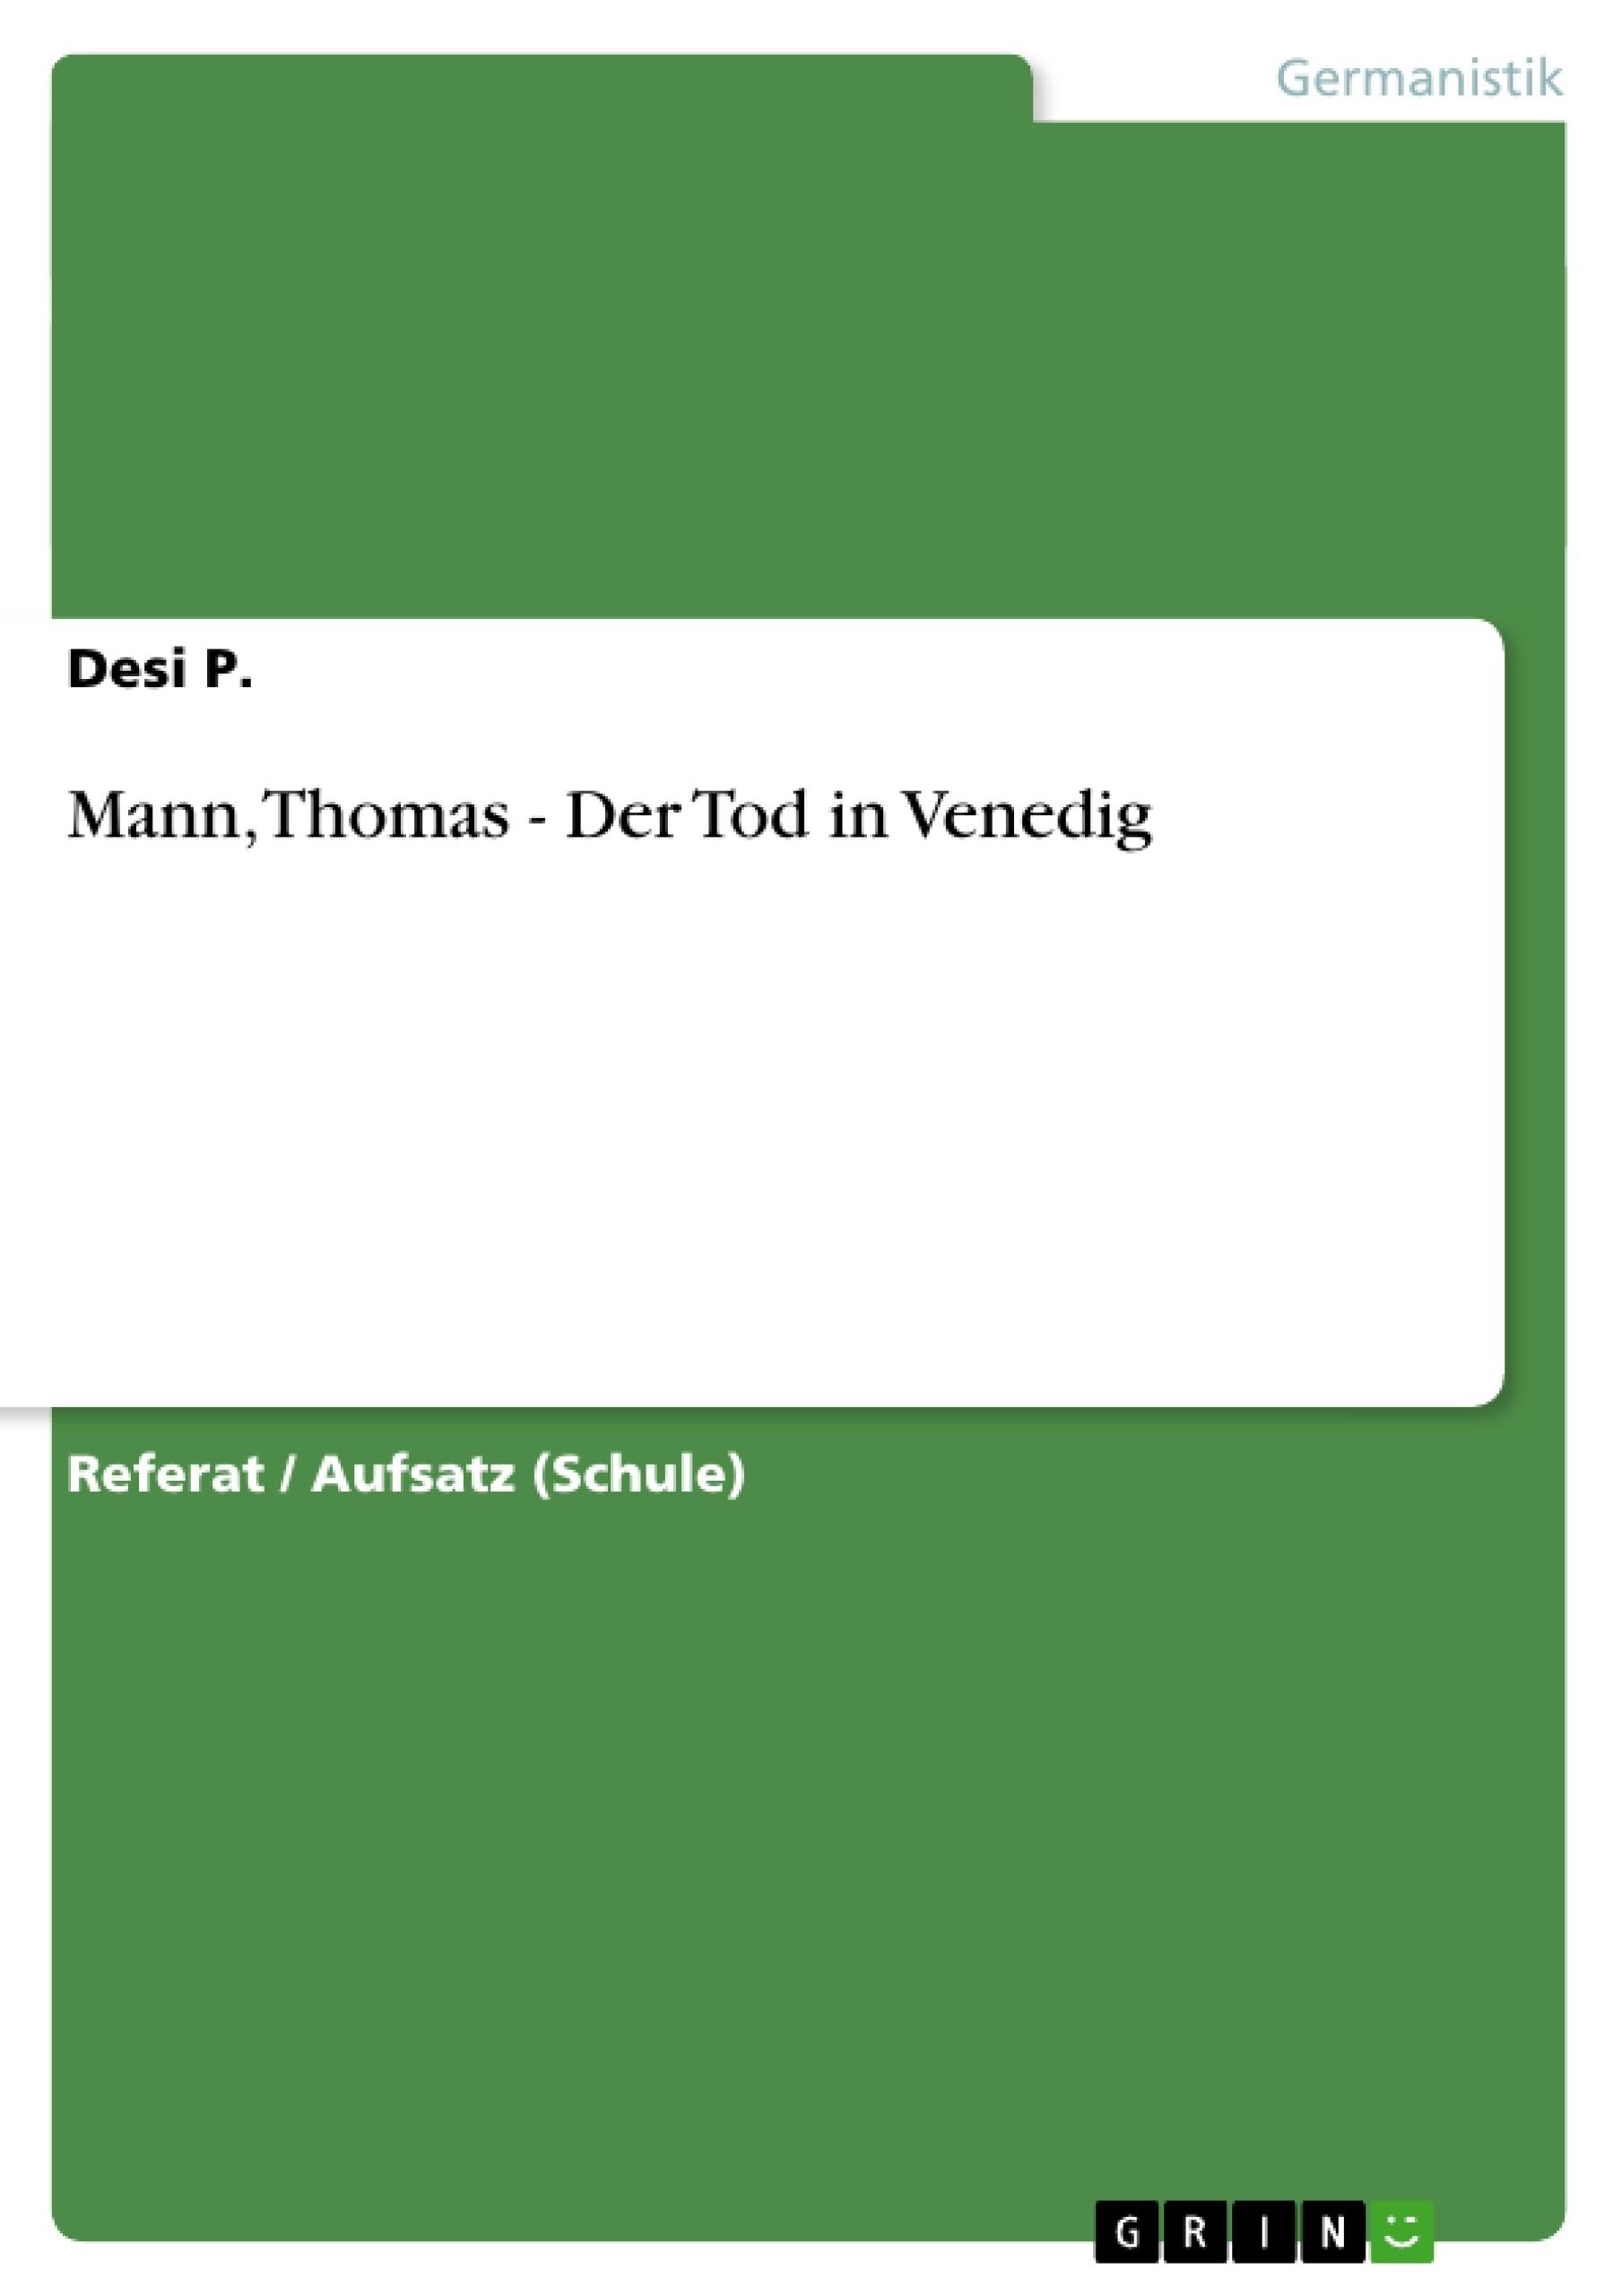 Titel: Mann, Thomas - Der Tod in Venedig